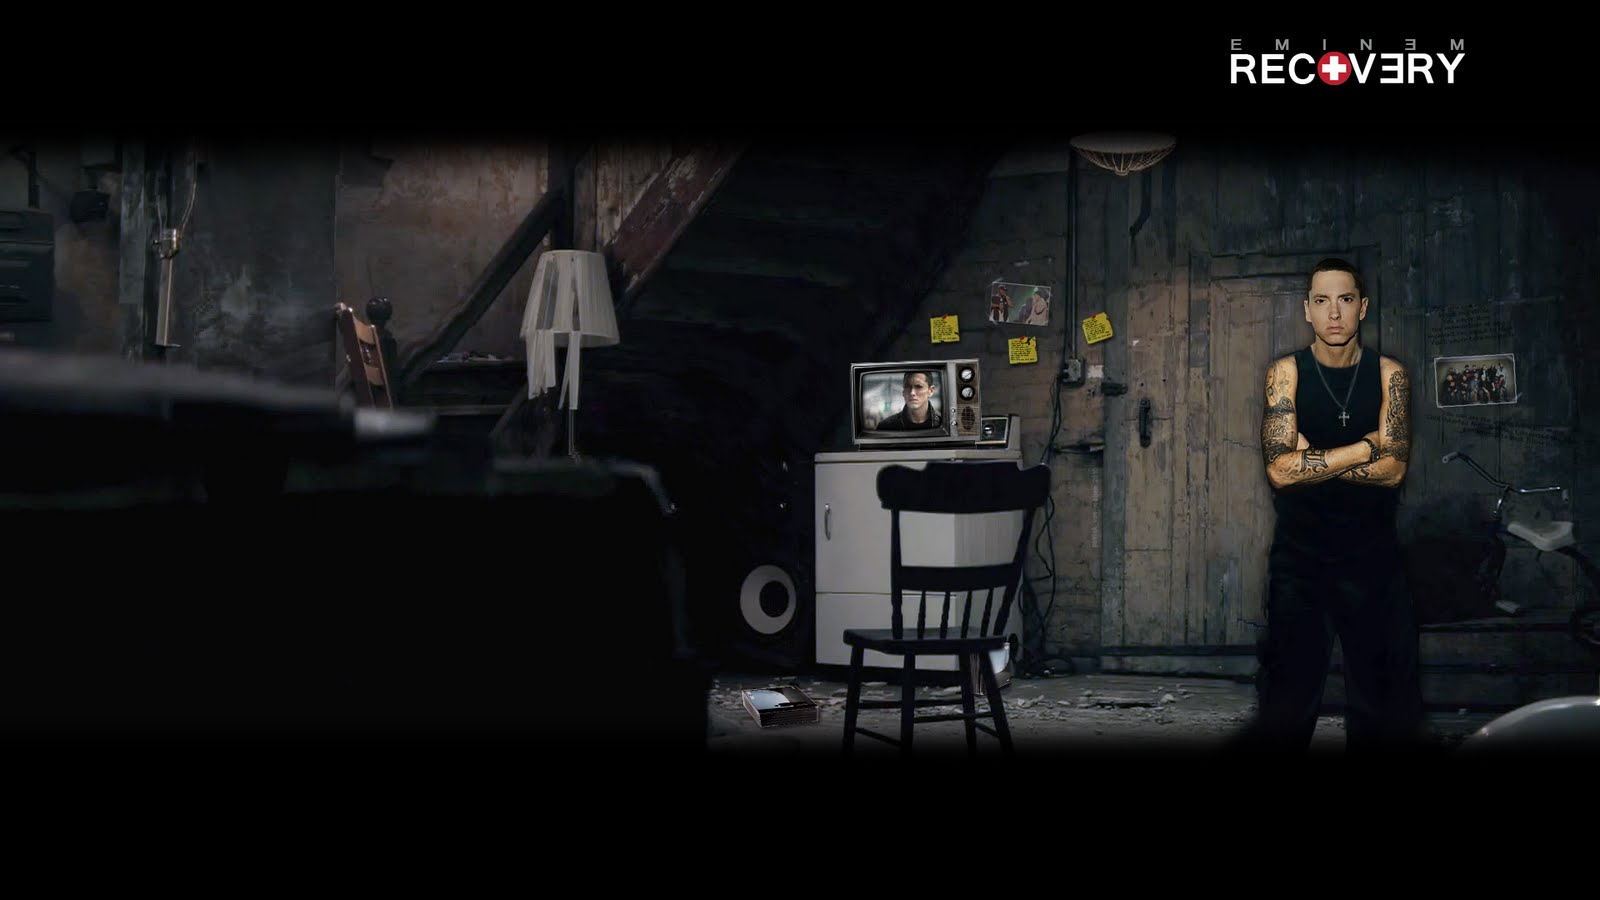 Eminem Recovery Wallpaper: Eminem wallpaper hd | eminem 8 ...